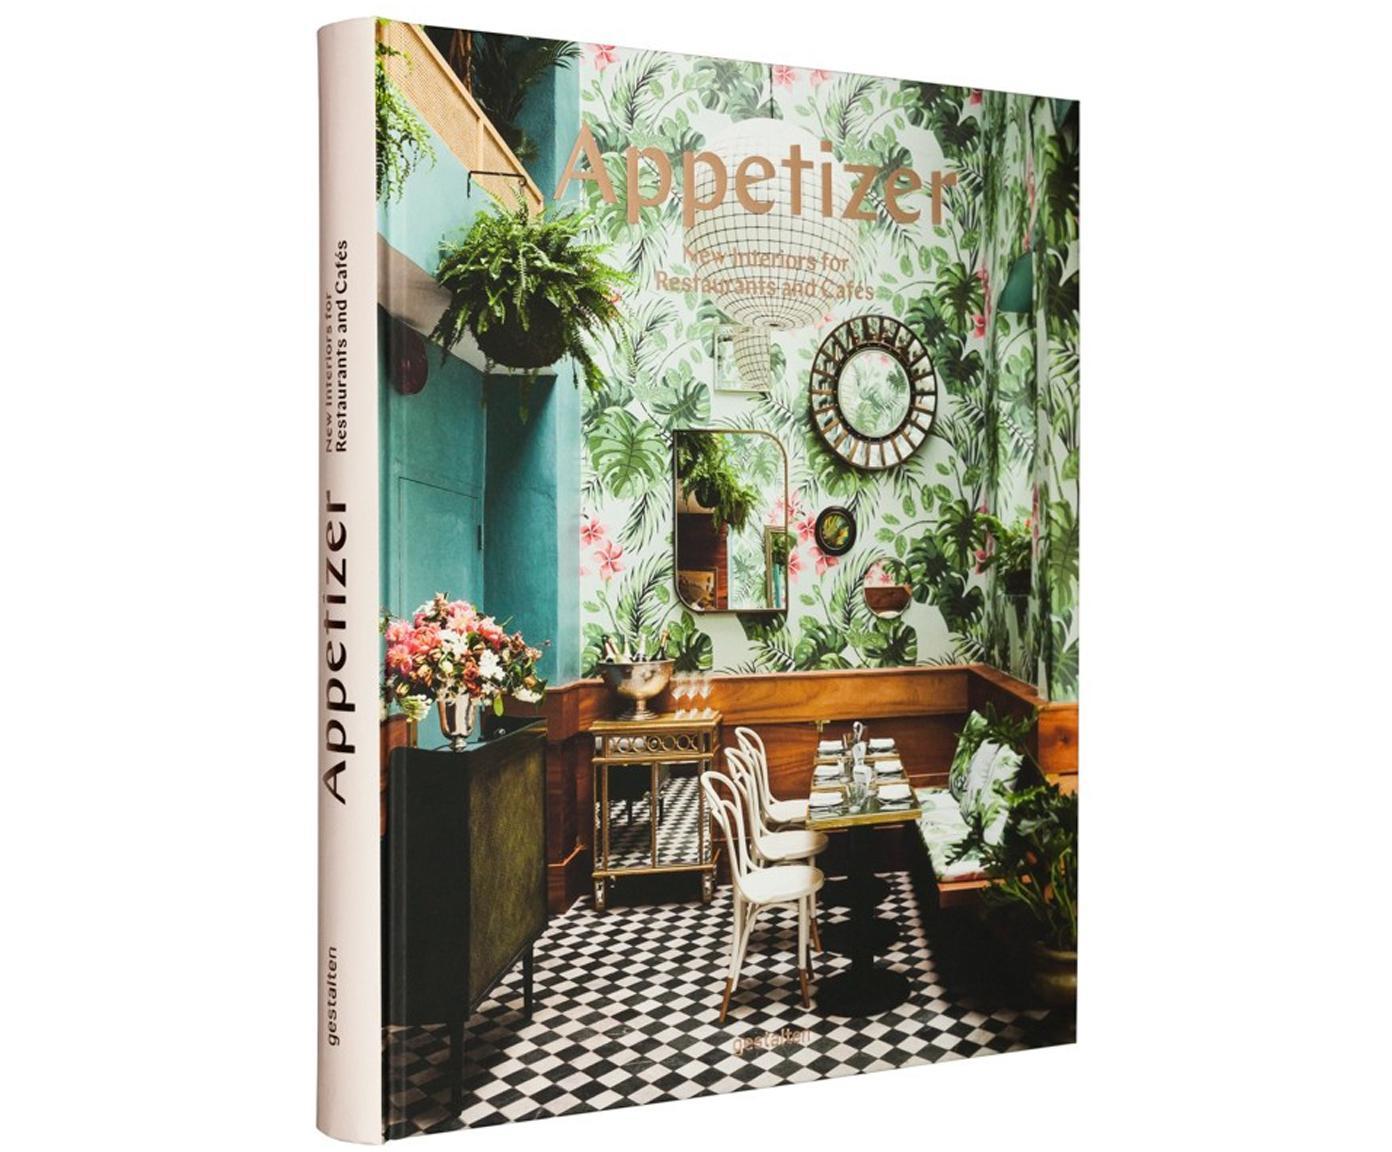 Geillustreerd boek Appetizer, Papier, hardcover, Multicolour, 24 x 30 cm